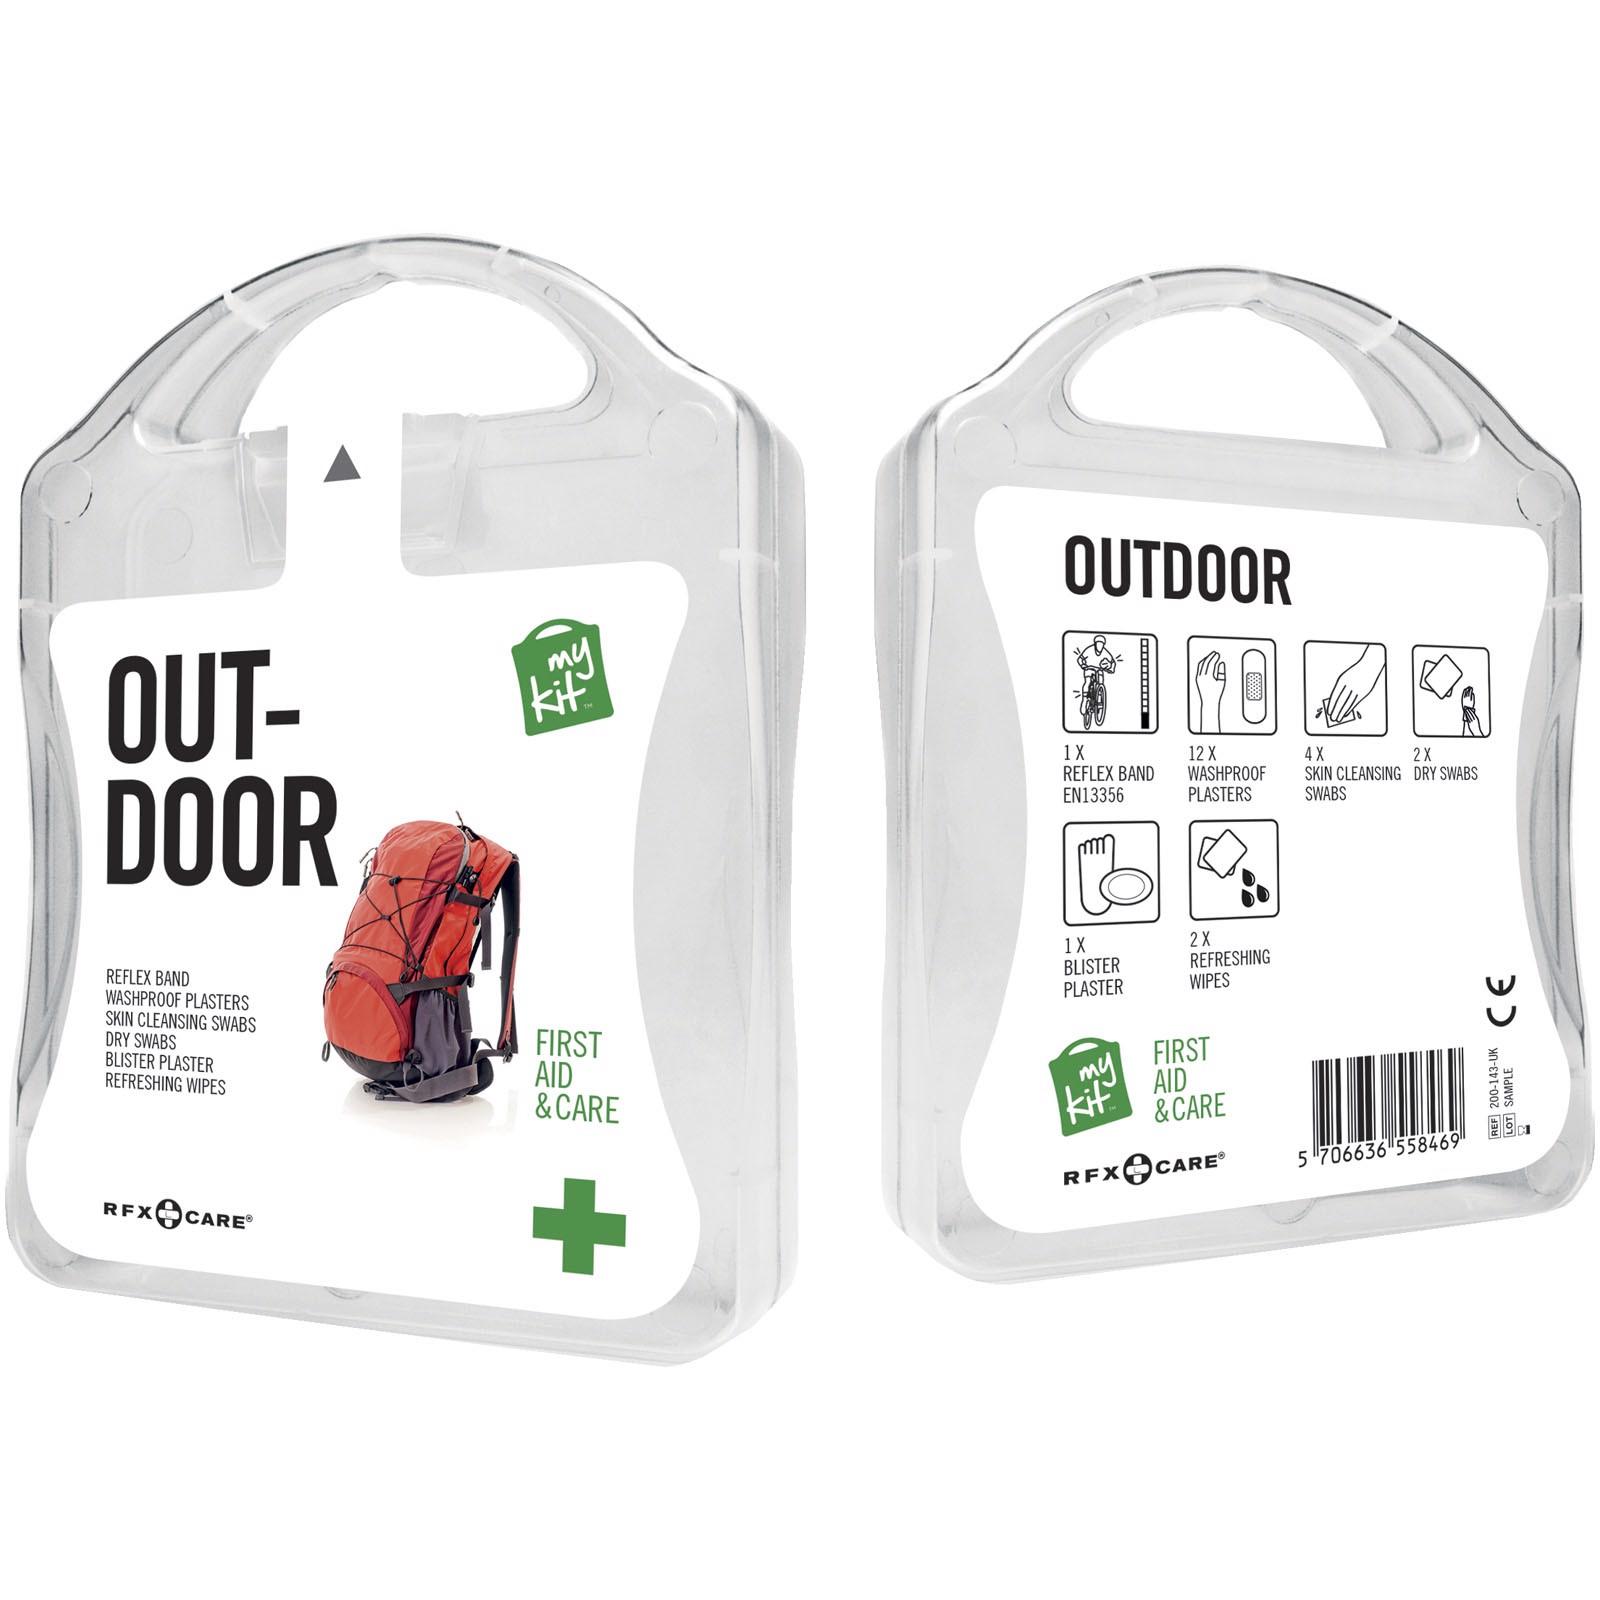 Lékarnička Outdoor - Bílá